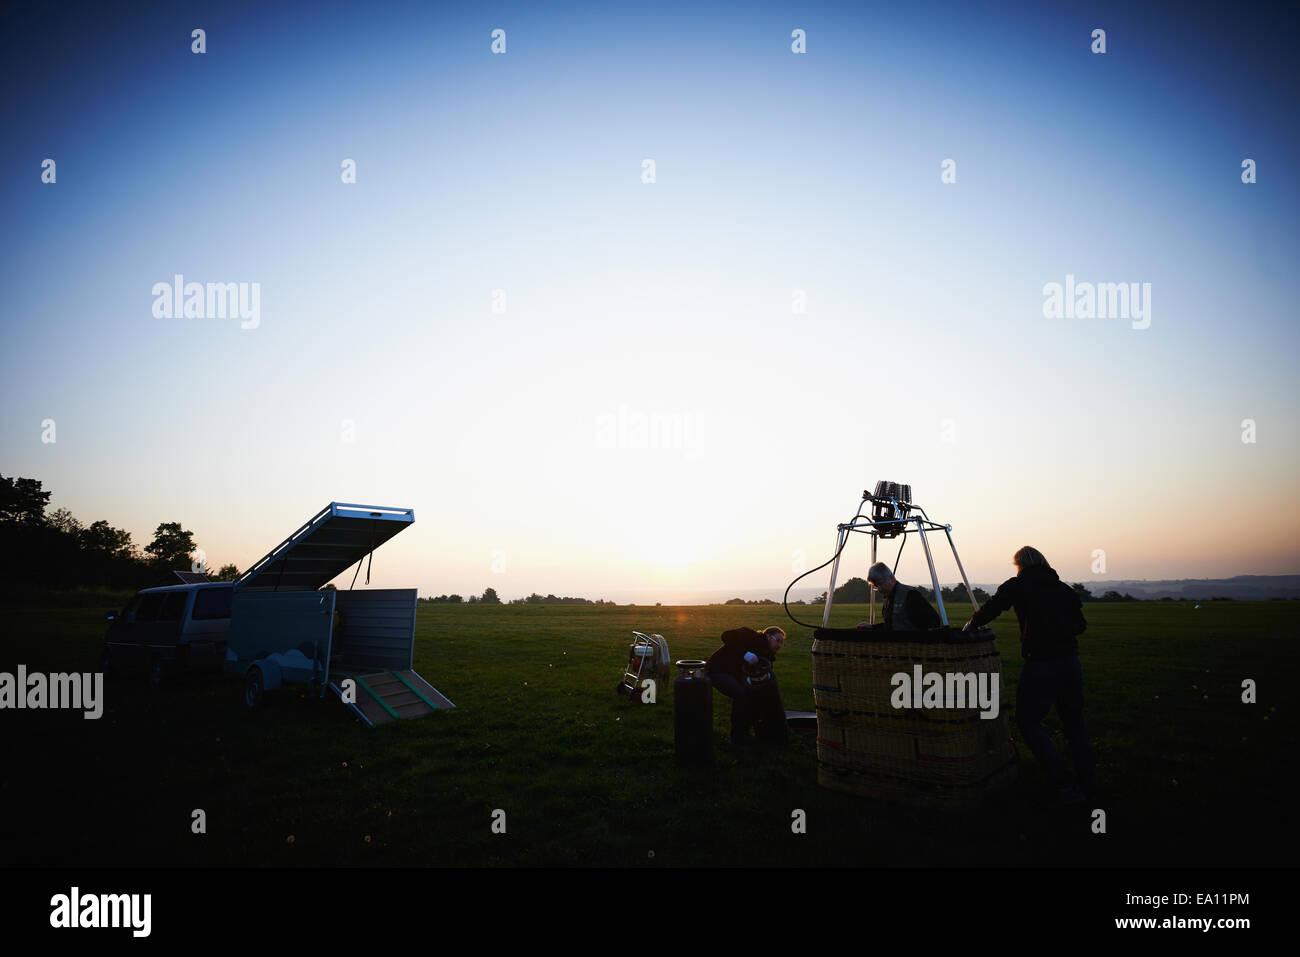 Men preparing hot air balloon - Stock Image